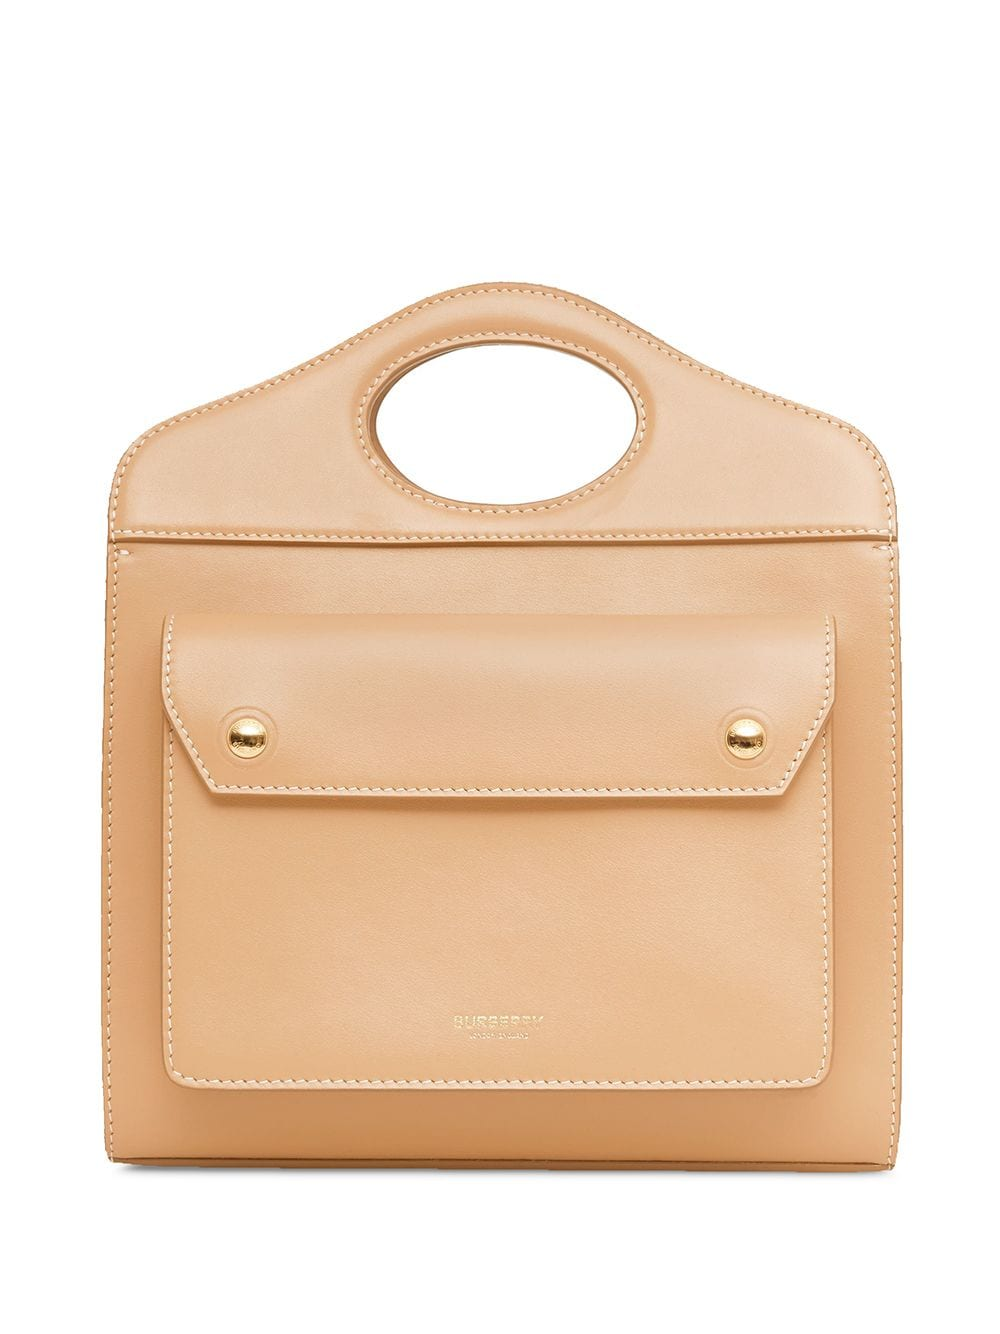 Burberry Mini Pocket Handtasche - Braun